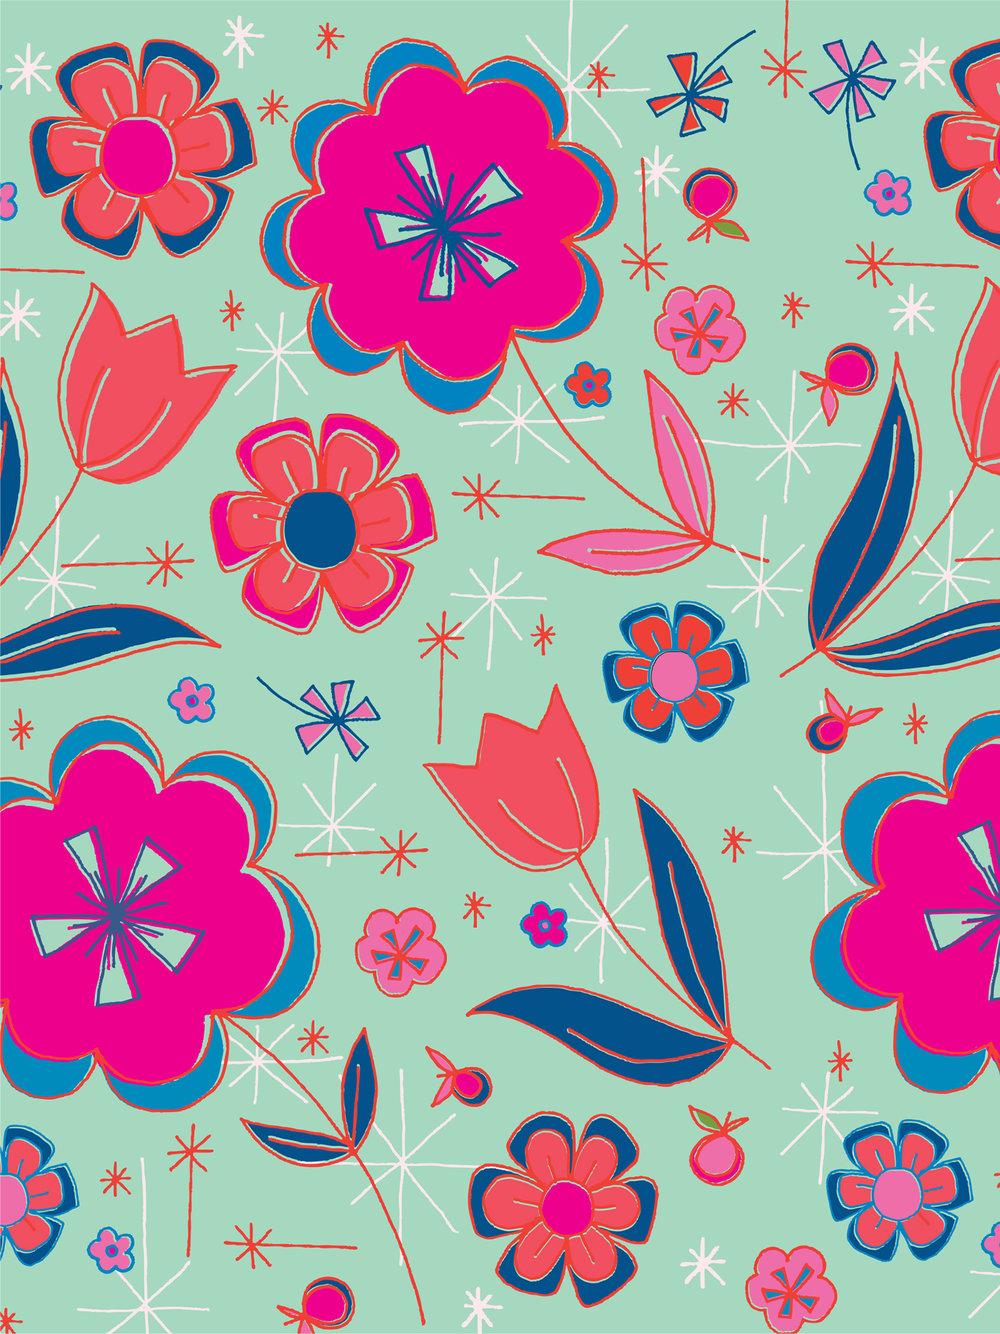 jami_darwin_retro_floral.jpg